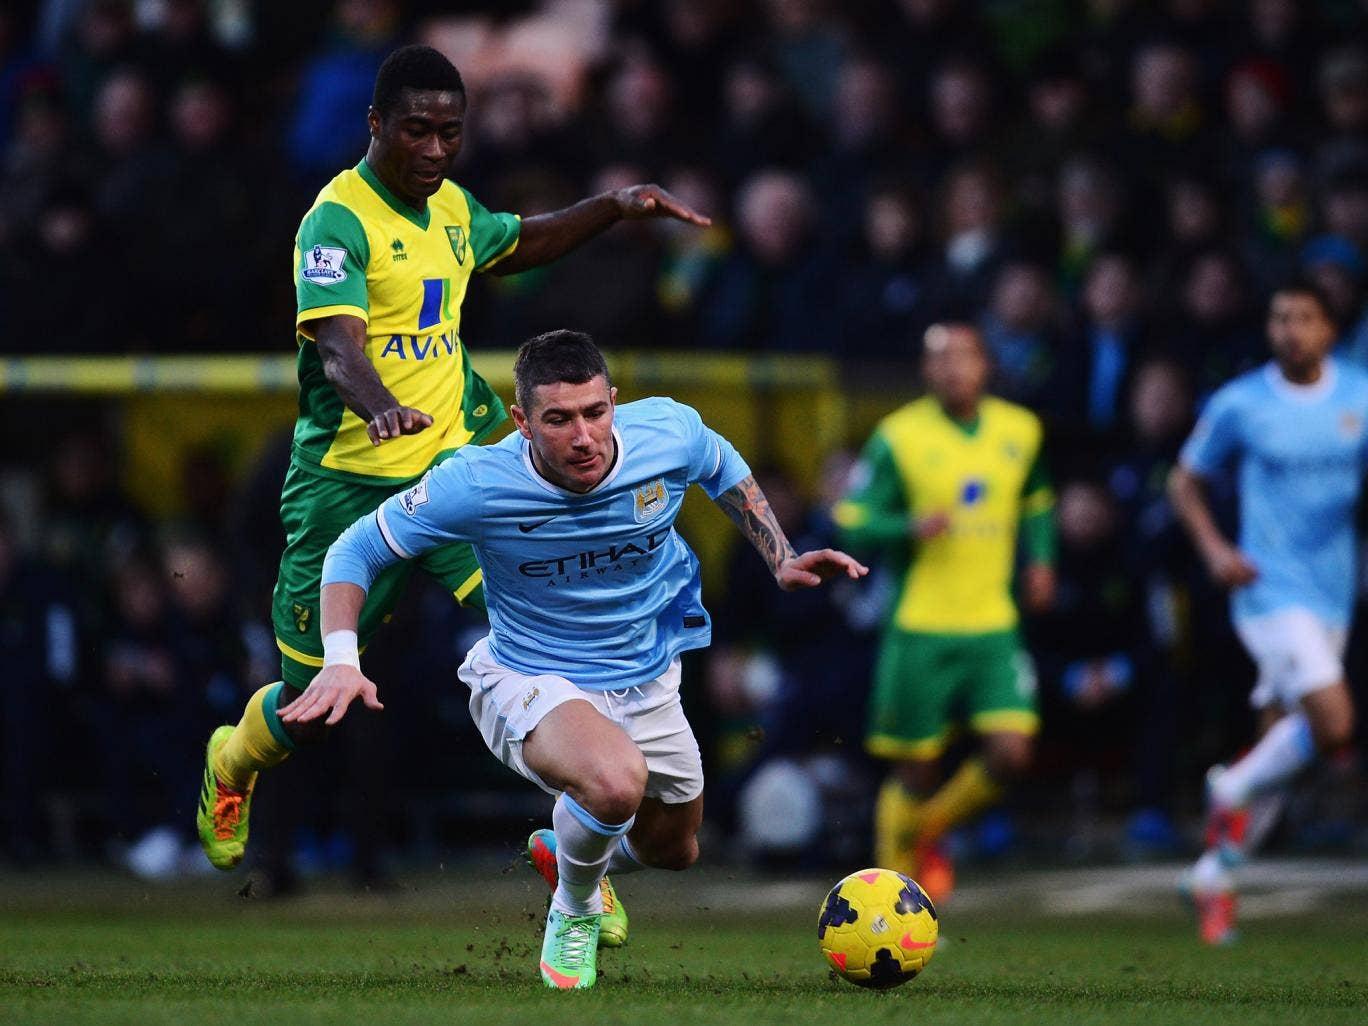 Manchester City defender Aleksandar Kolarov falls to the under pressure from Norwich midfielder Alexander Tettey